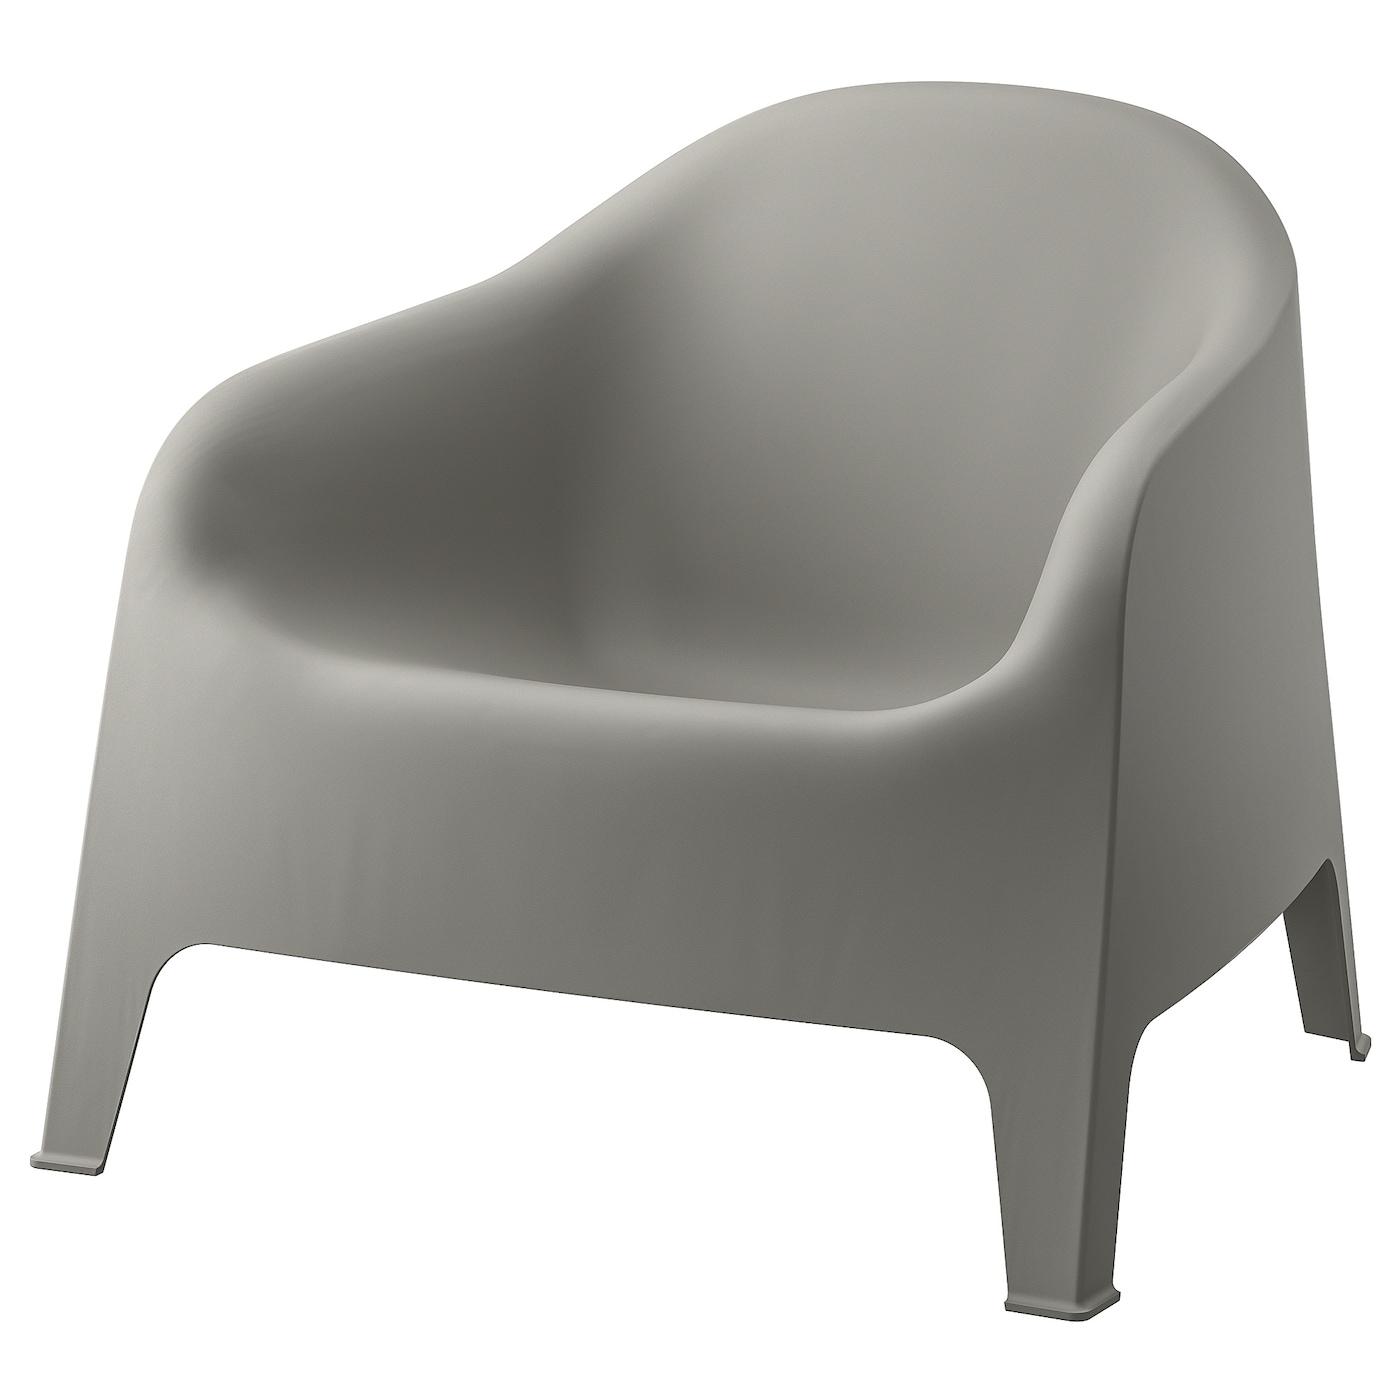 sportskor ganska trevligt Perfekt kvalite ikea stol ute